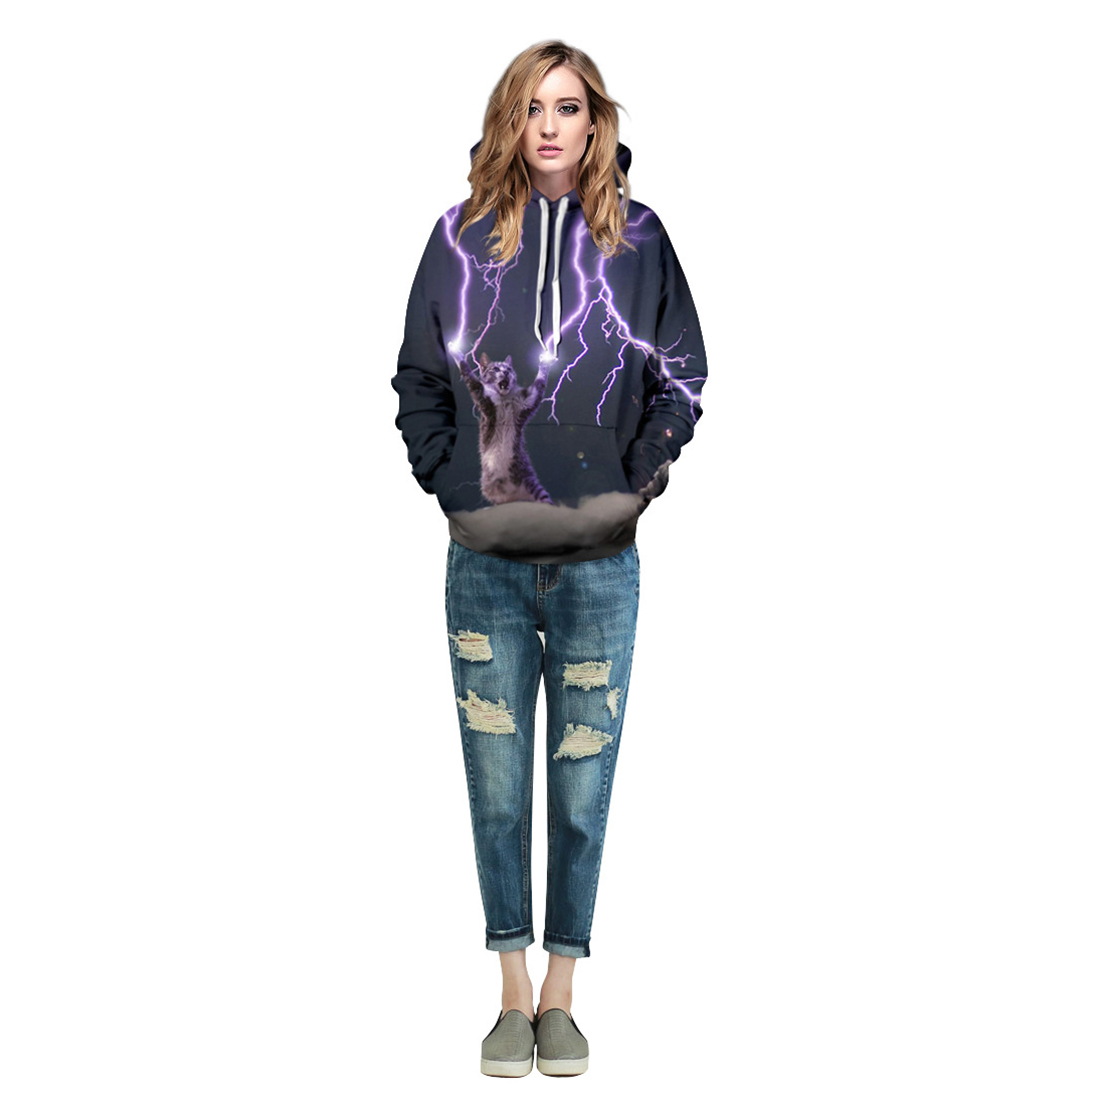 Men/Women New Fashion 3d Sweatshirt Digital Printing Lightning Cat Long Sleeve Casual Hoodies Cap Thin Hoody